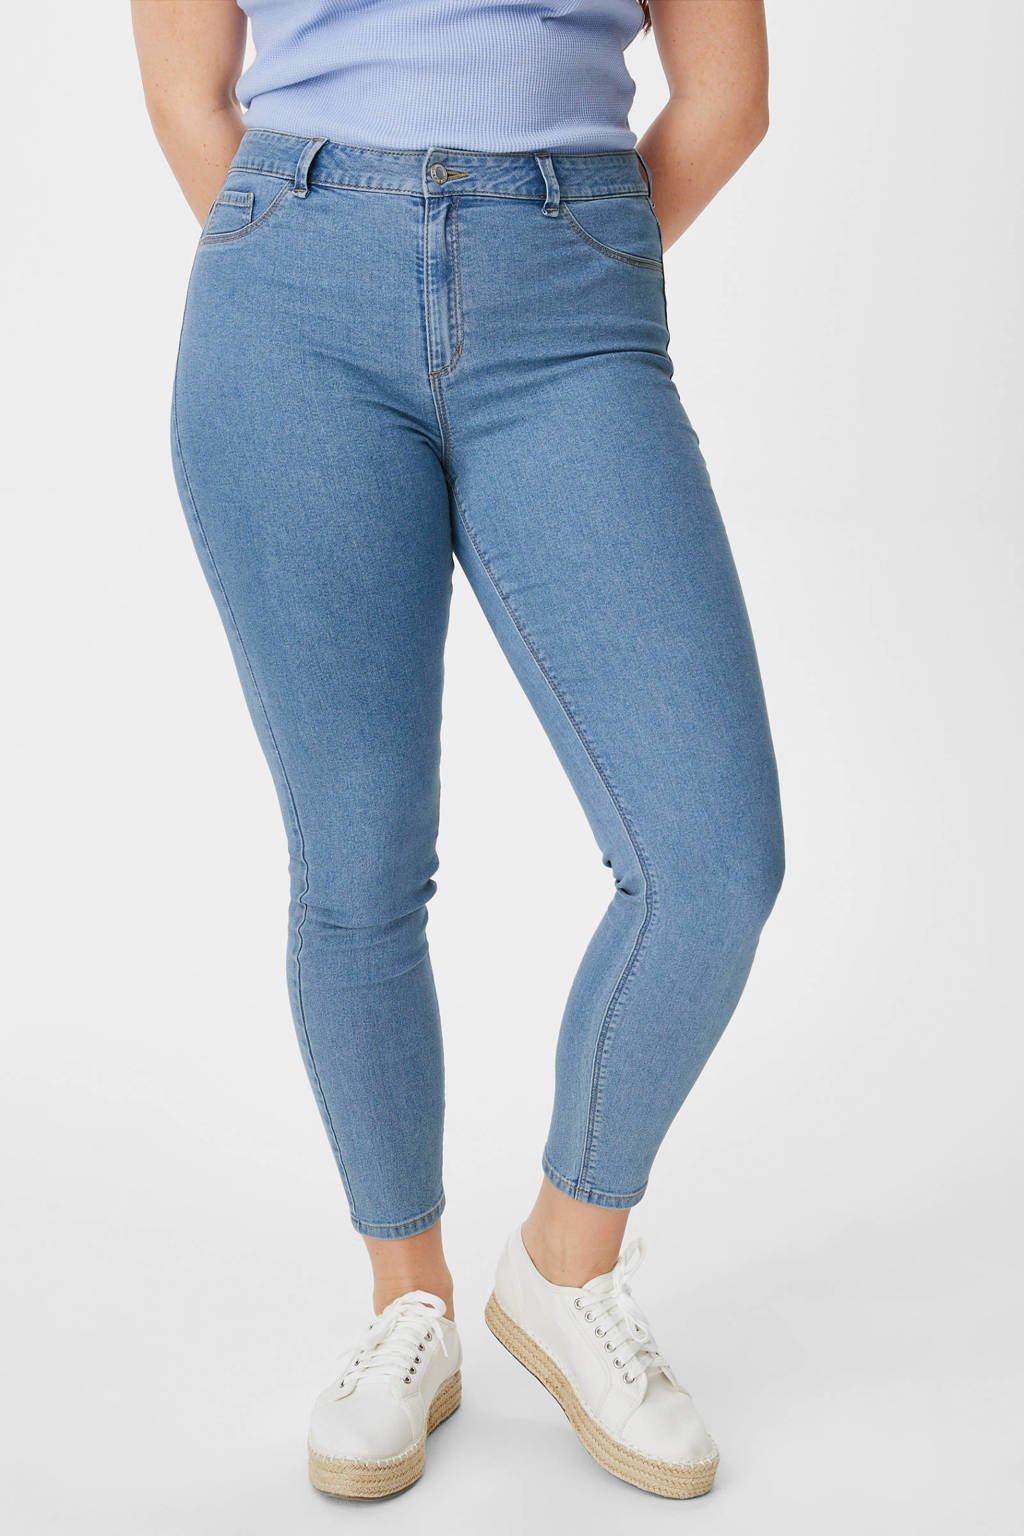 C&A XL Clockhouse high waist super skinny jeans light denim, Light denim